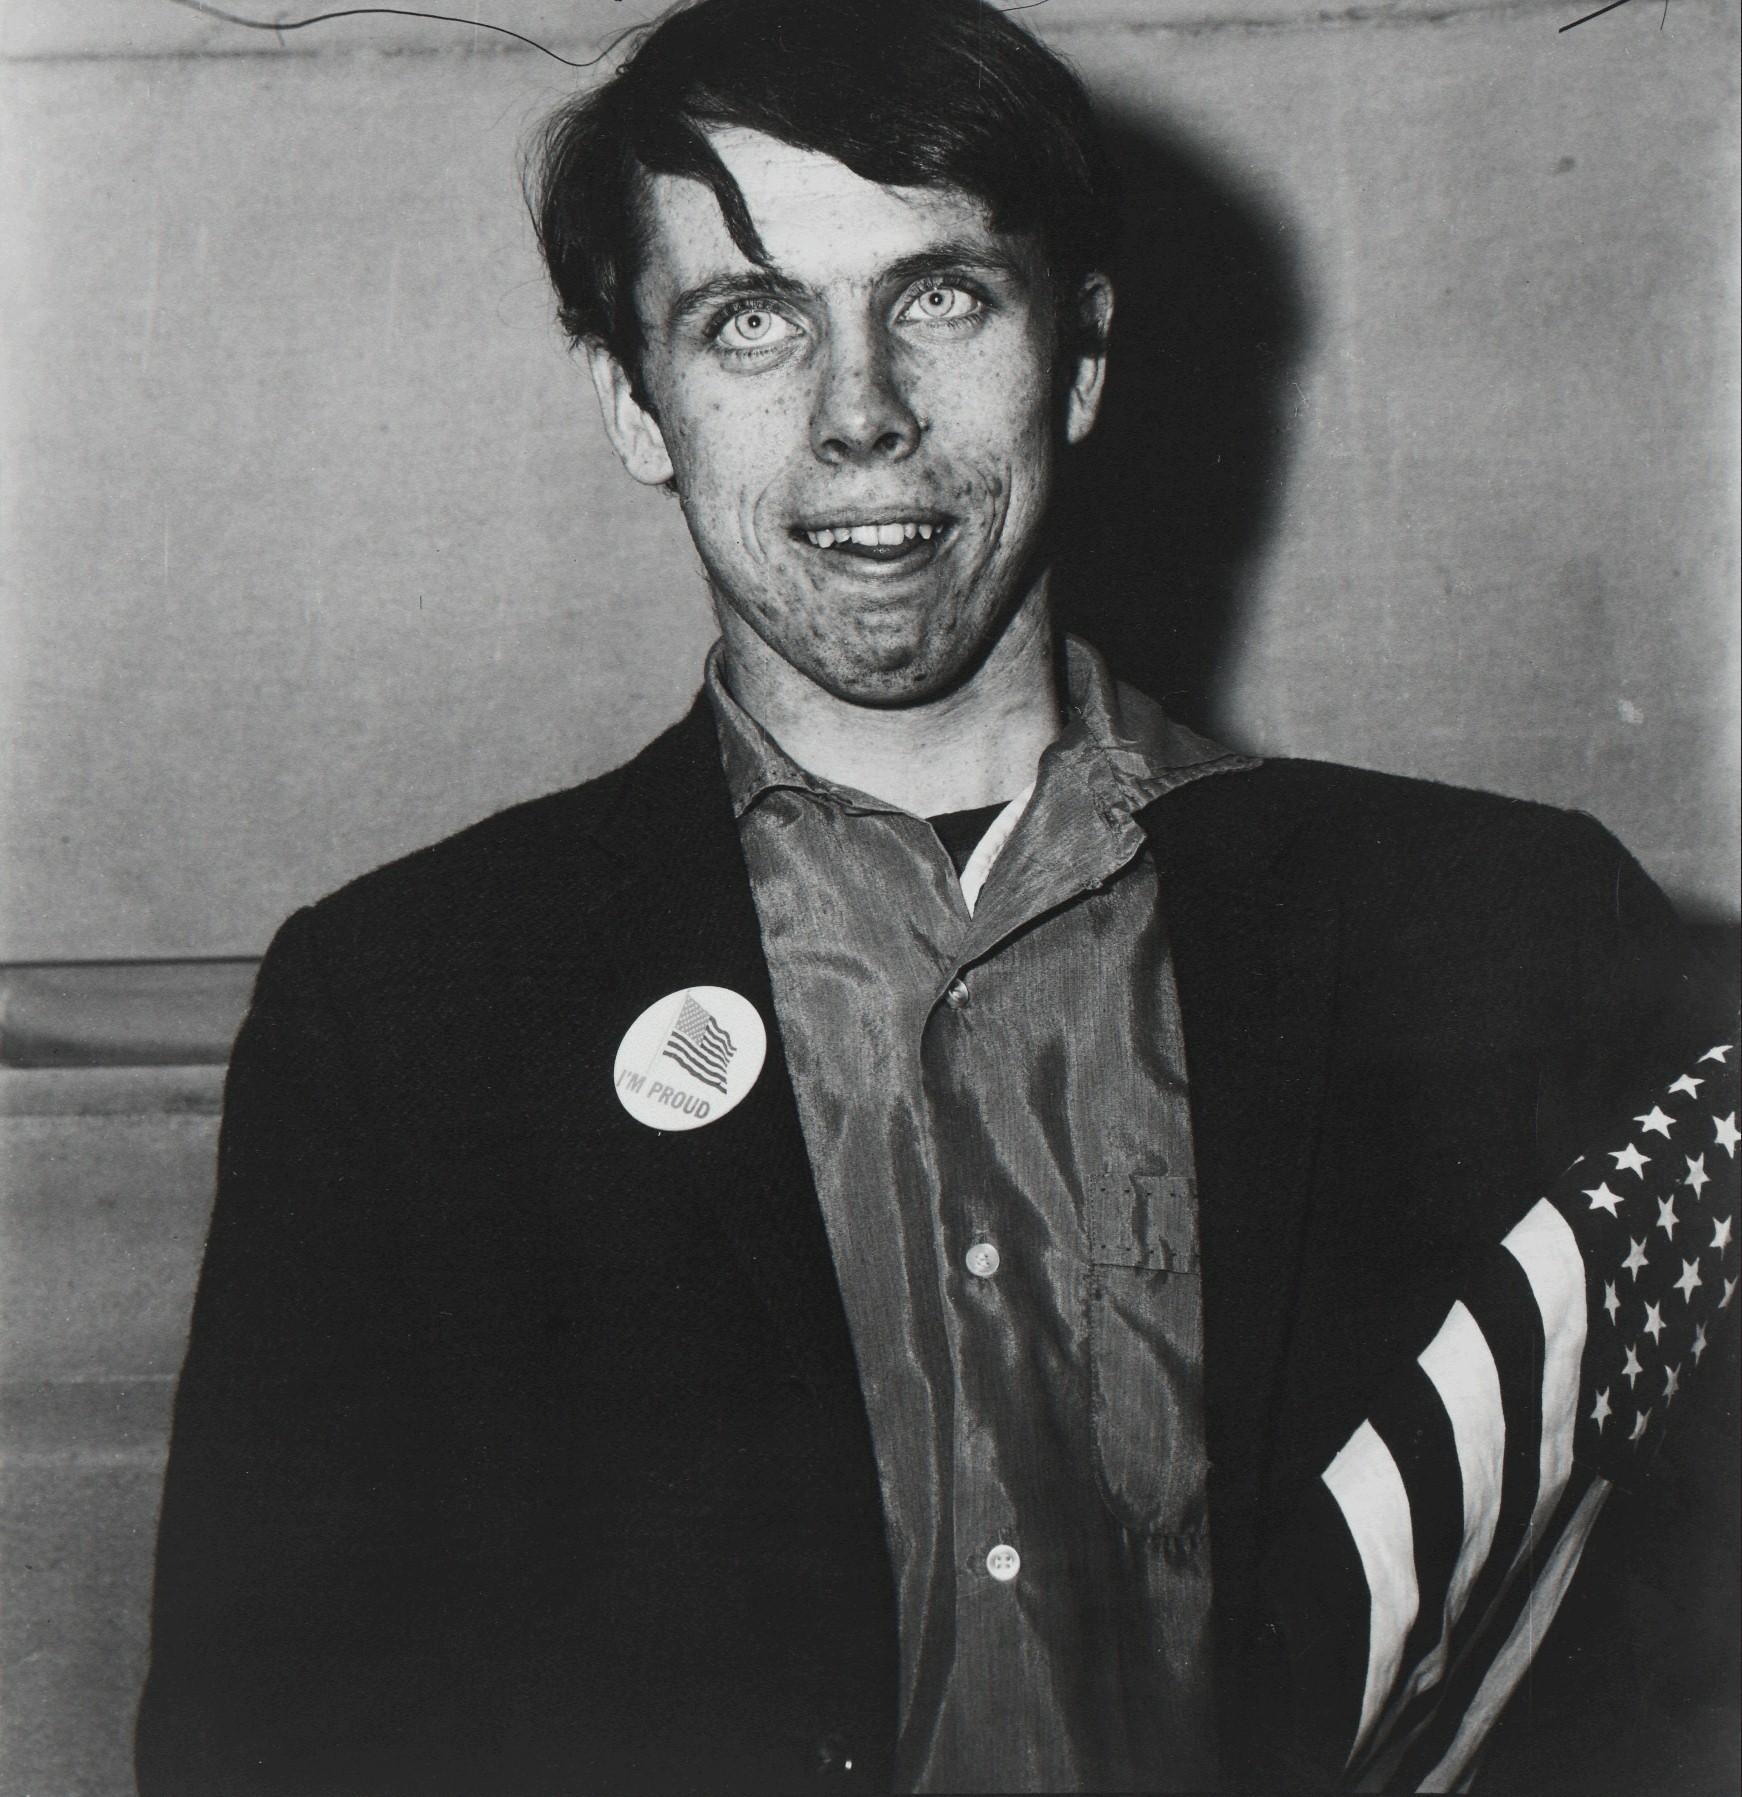 Юноша-патриот с флагом, Нью-Йорк, 1967. Фотограф Диана Арбус